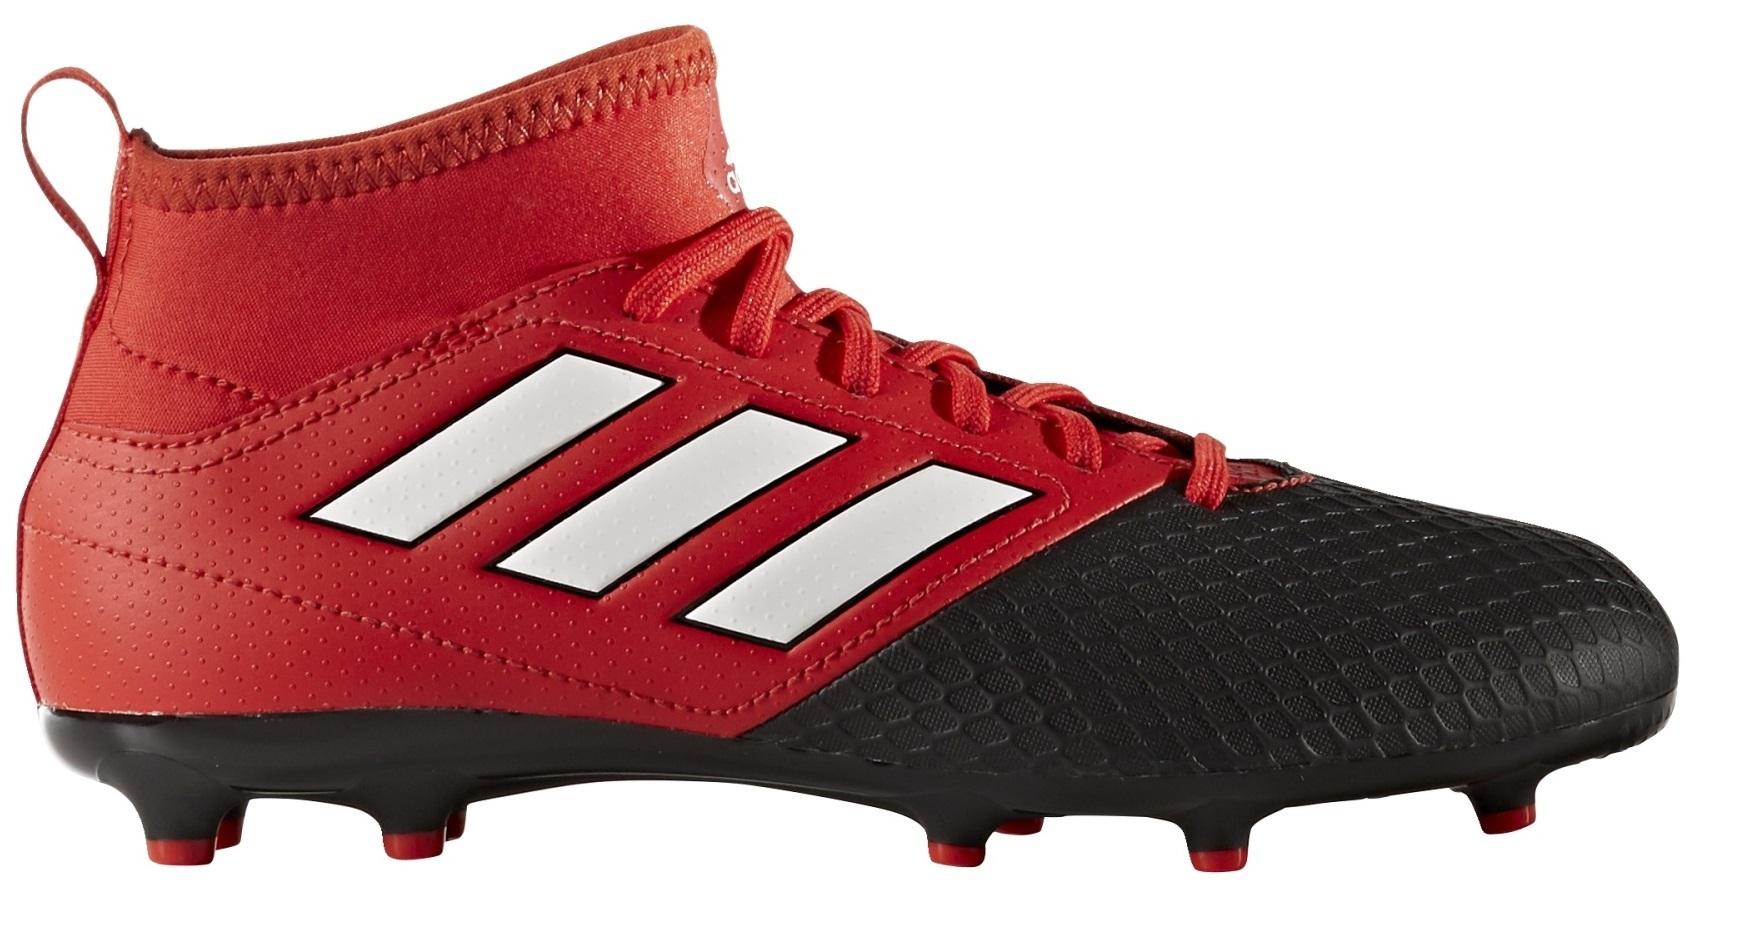 scarpe calcio adidas per bambini